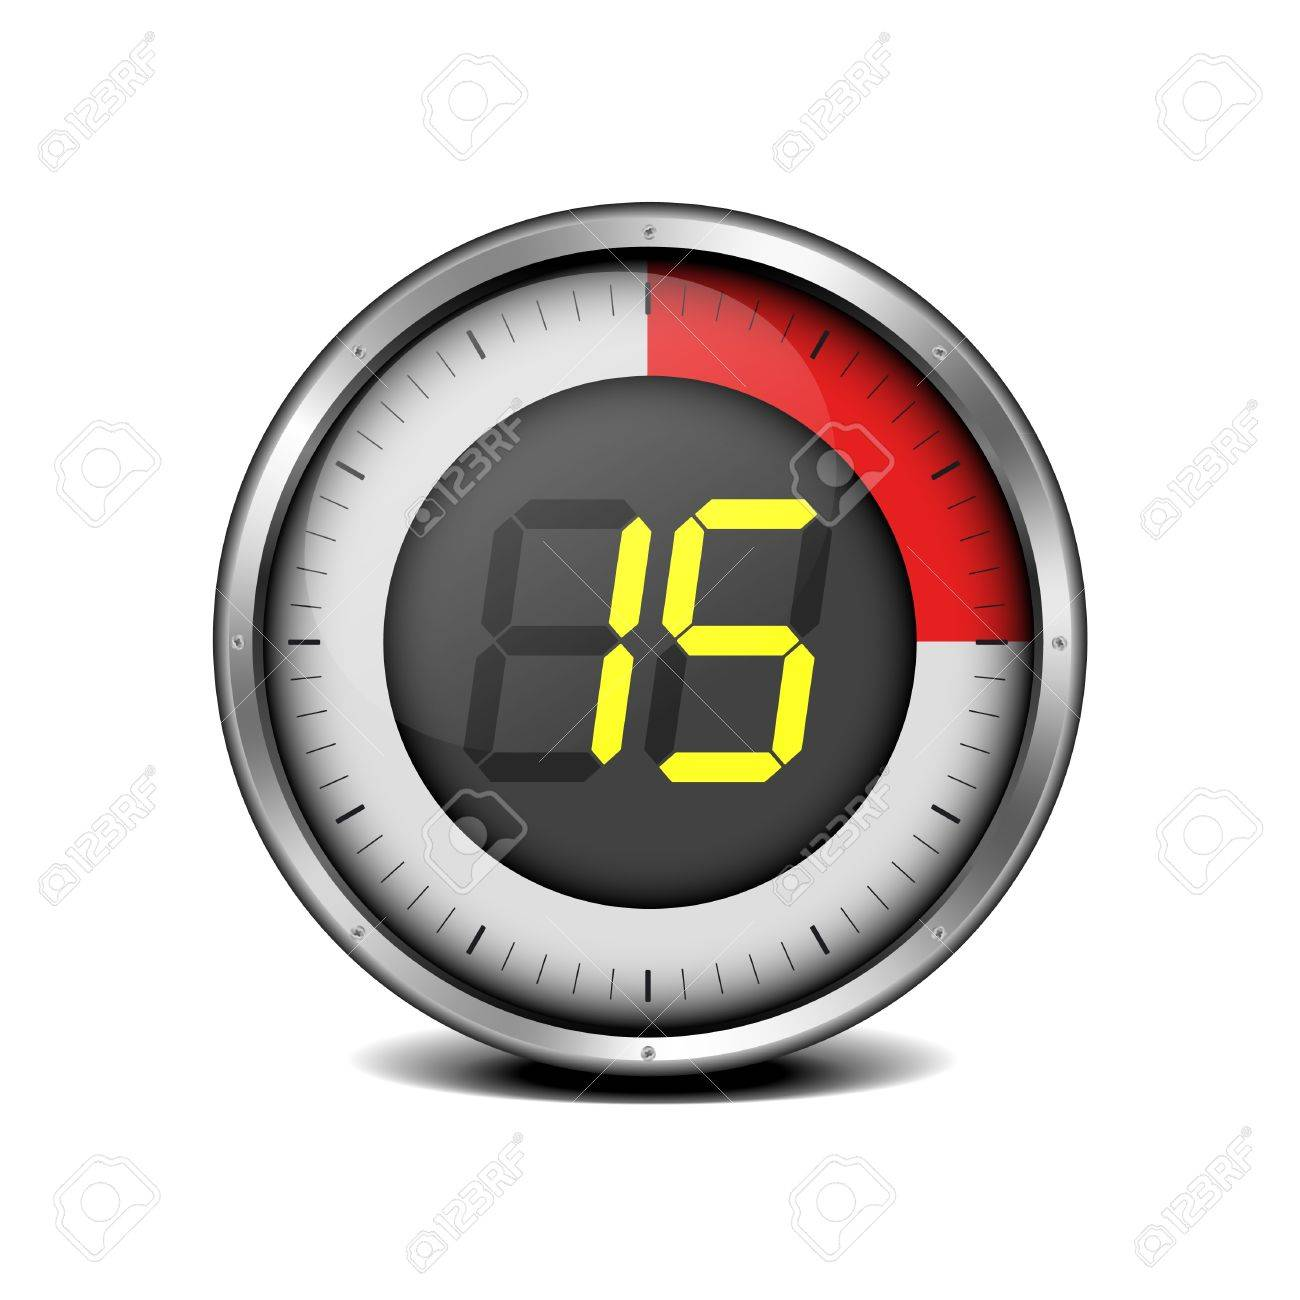 illustration of a metal framed timer with the number 15 - 18689660